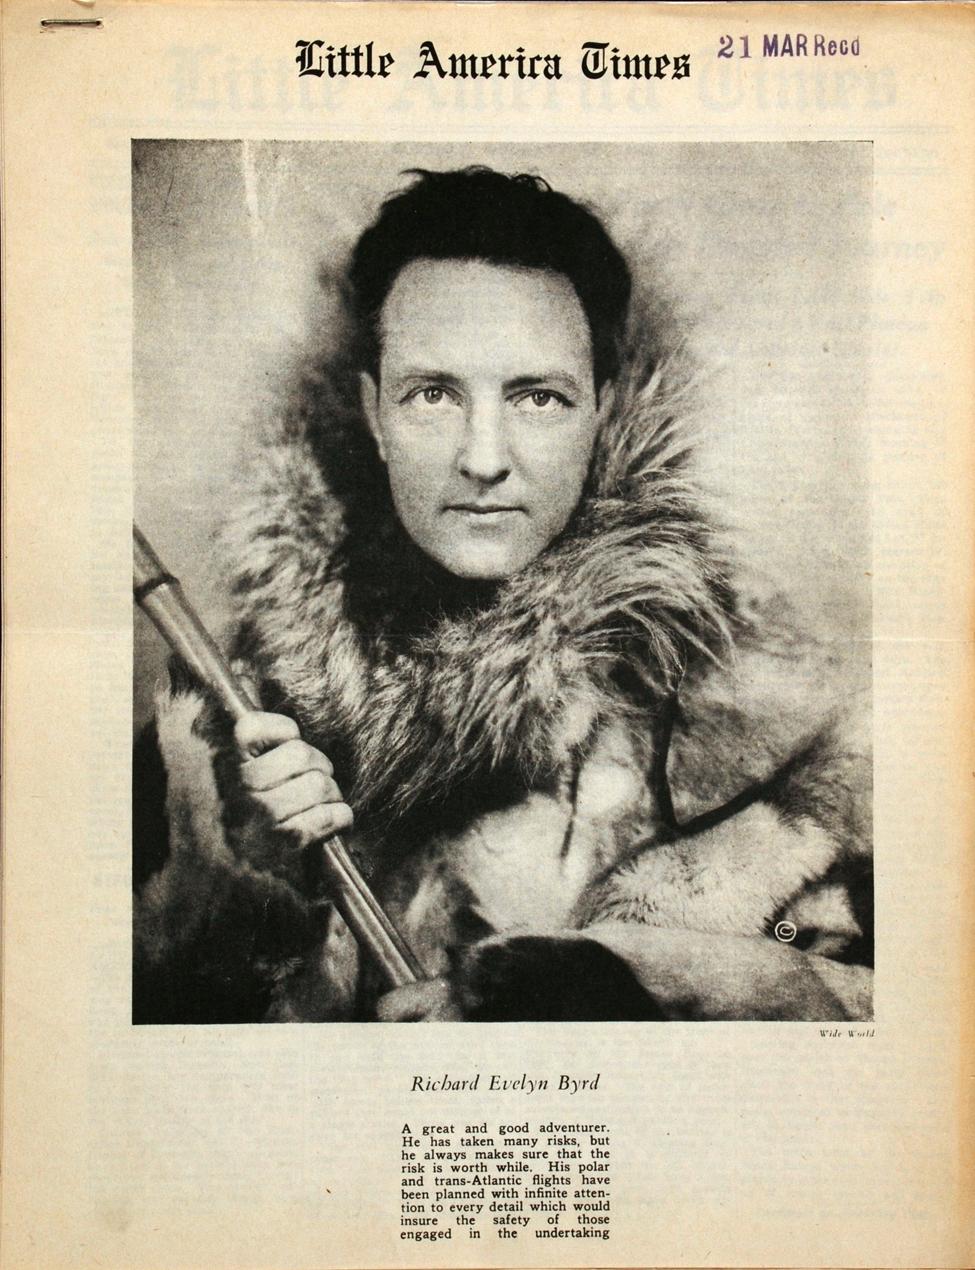 <i>Little America Times</i>. New York: August Horowitz, 31 January 1935.